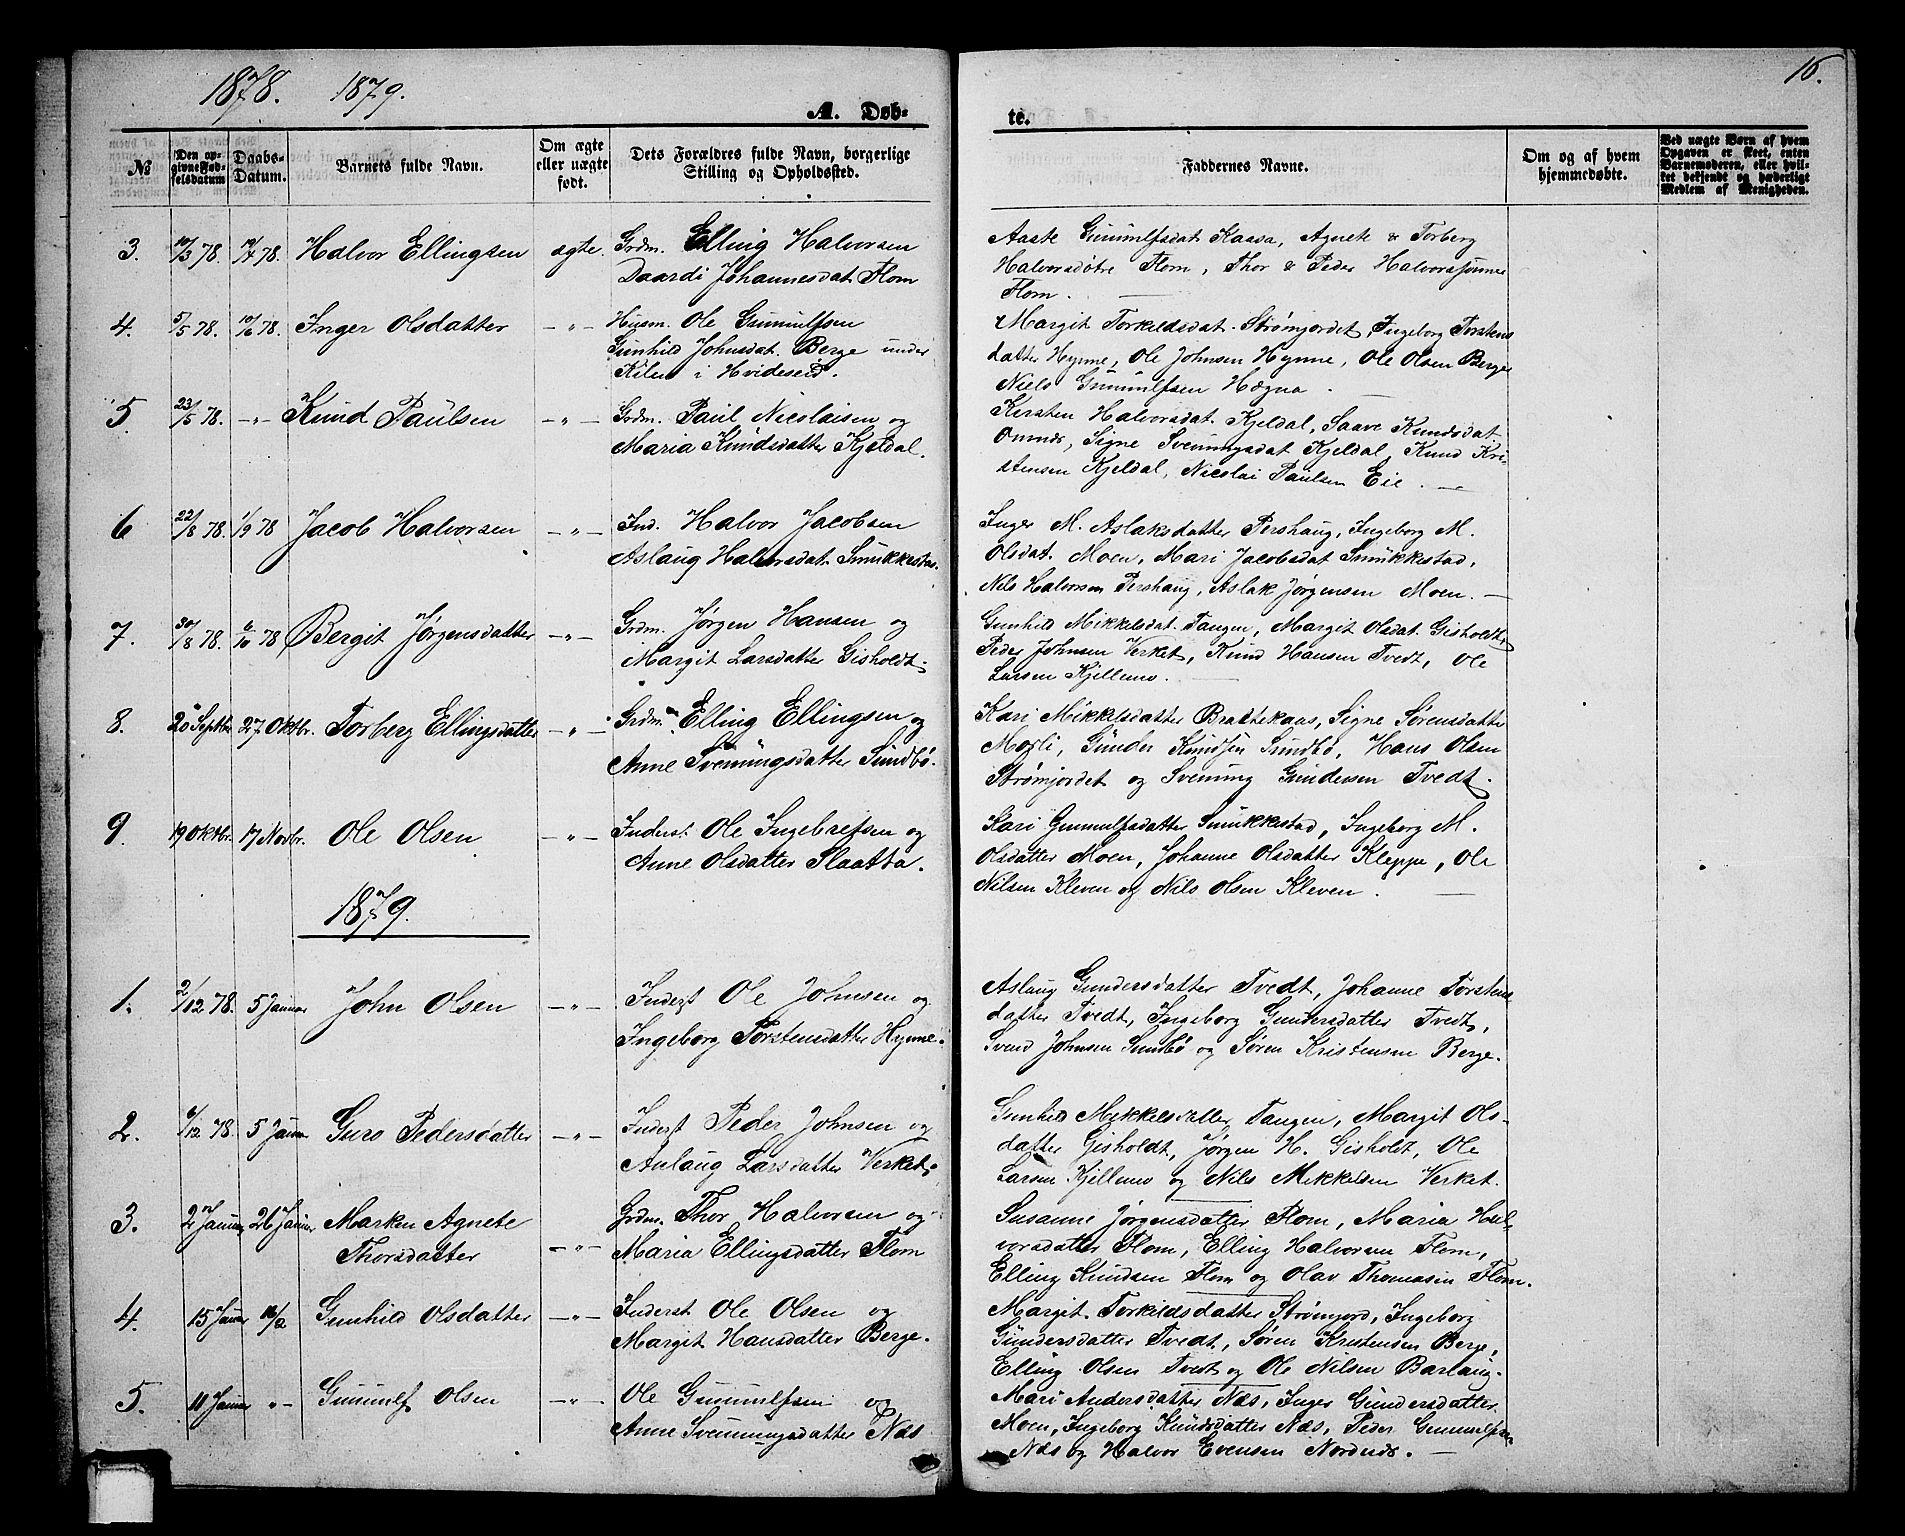 SAKO, Lunde kirkebøker, G/Gb/L0001: Klokkerbok nr. II 1, 1866-1887, s. 16